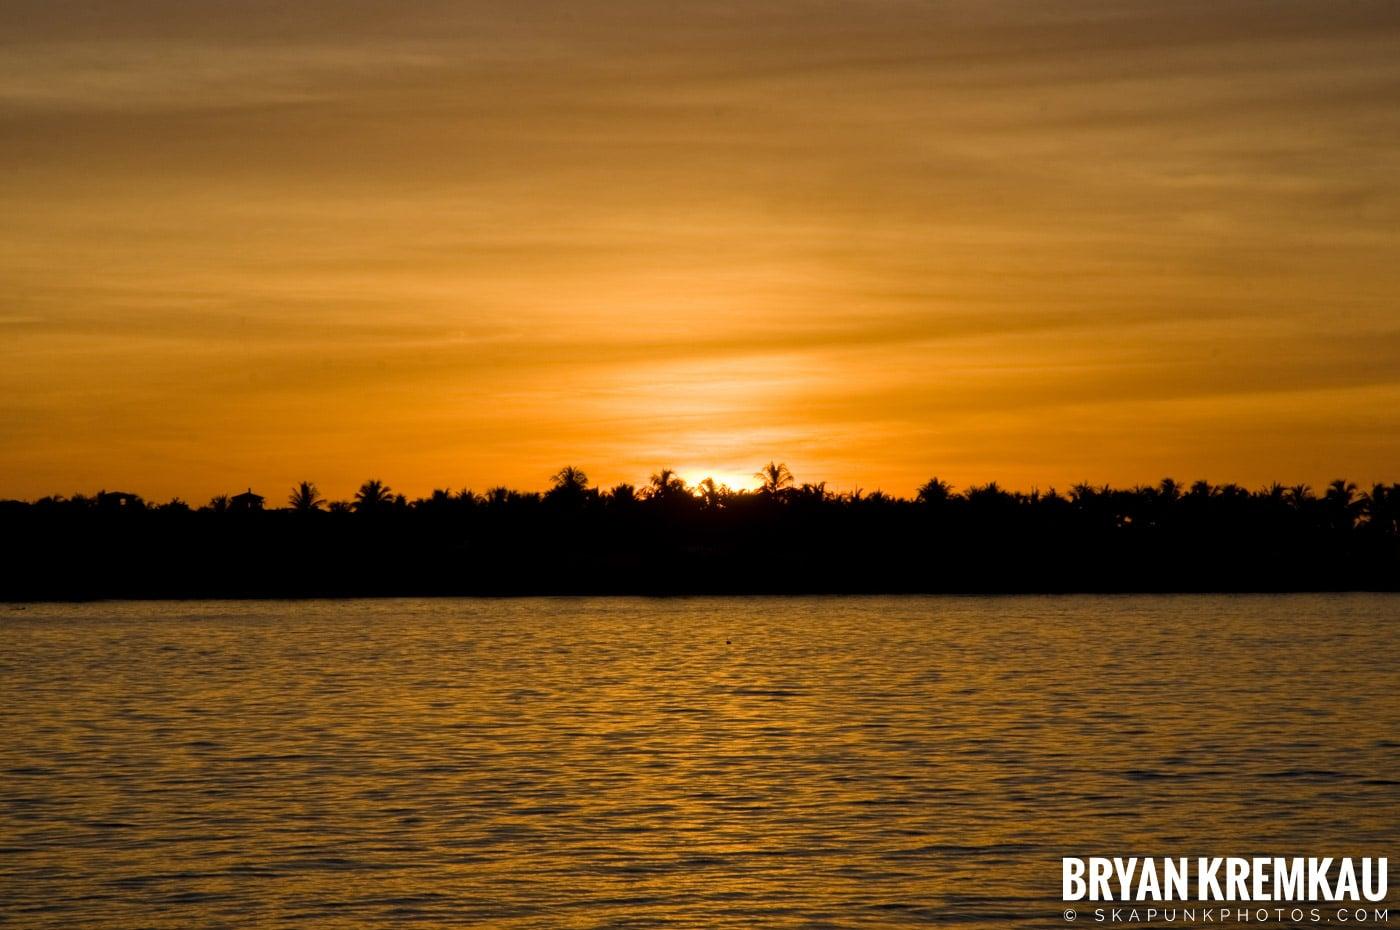 Florida Keys Vacation - 7.09.10 - 7.15.10 (18)